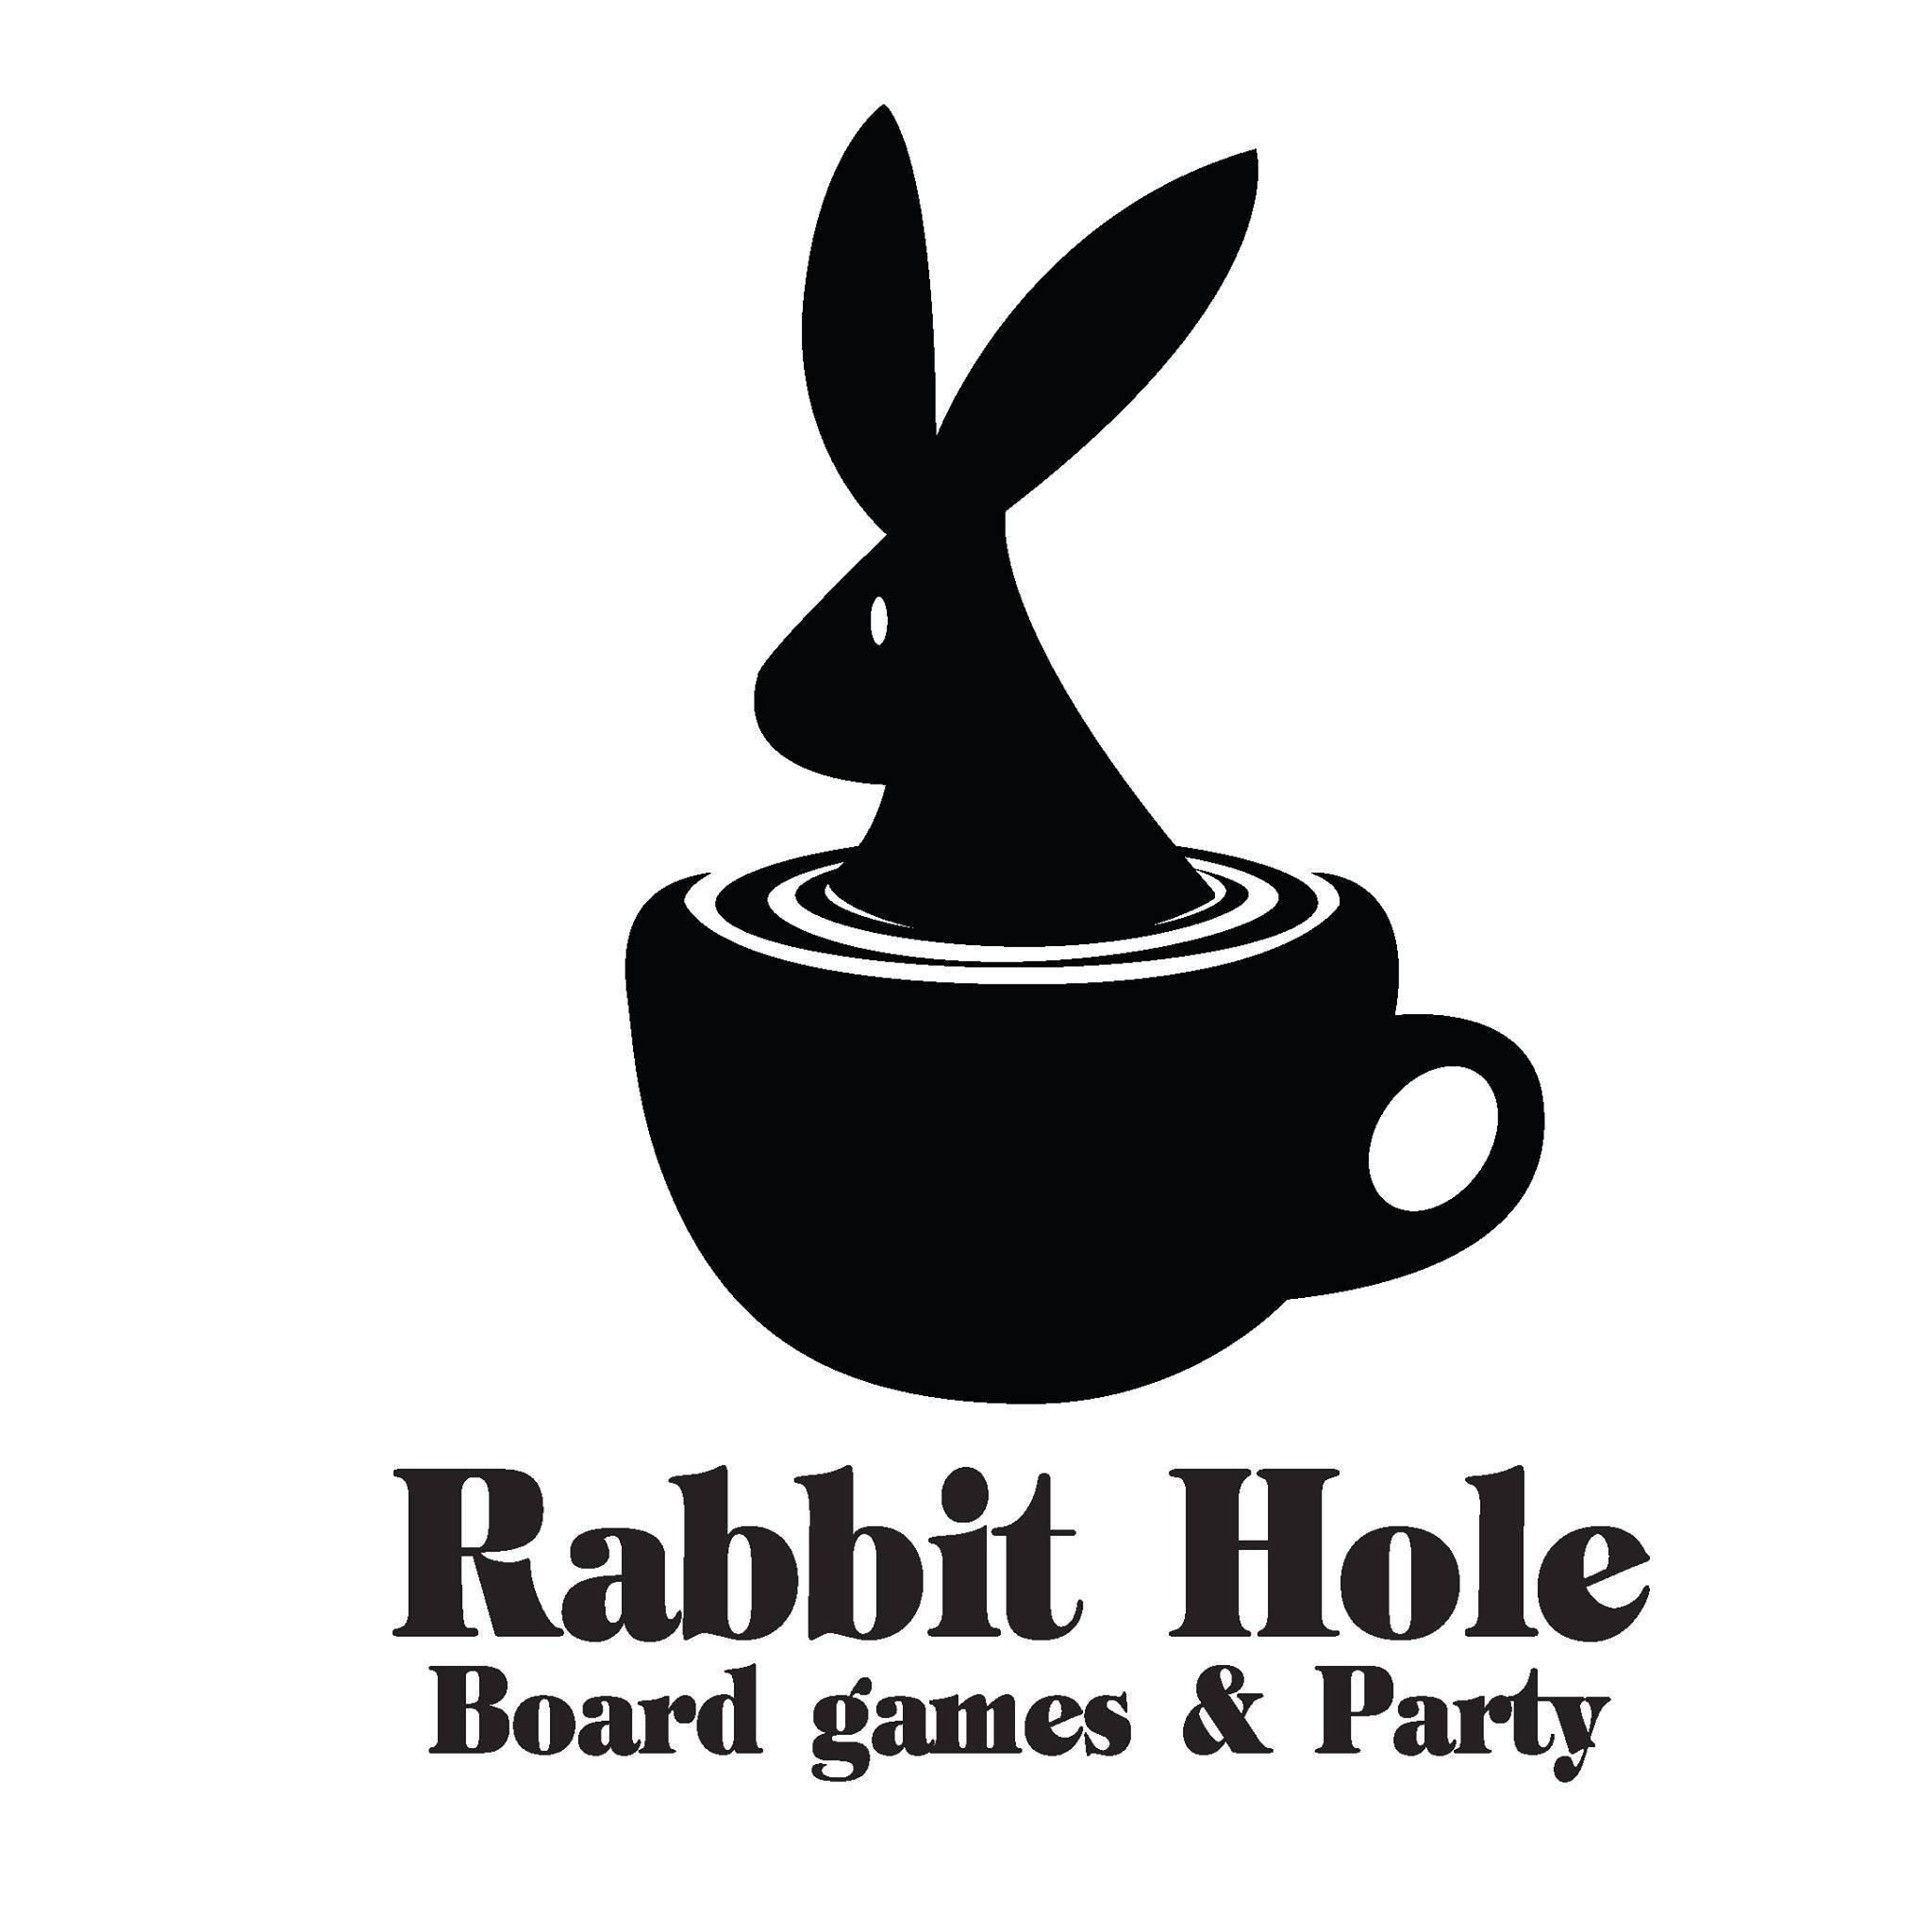 Rabbit Hole Board Game คาเฟ่บอร์ดเกมพร้อมเพื่อนๆรู้ใจไปกับเกมใหม่ๆเพียบ